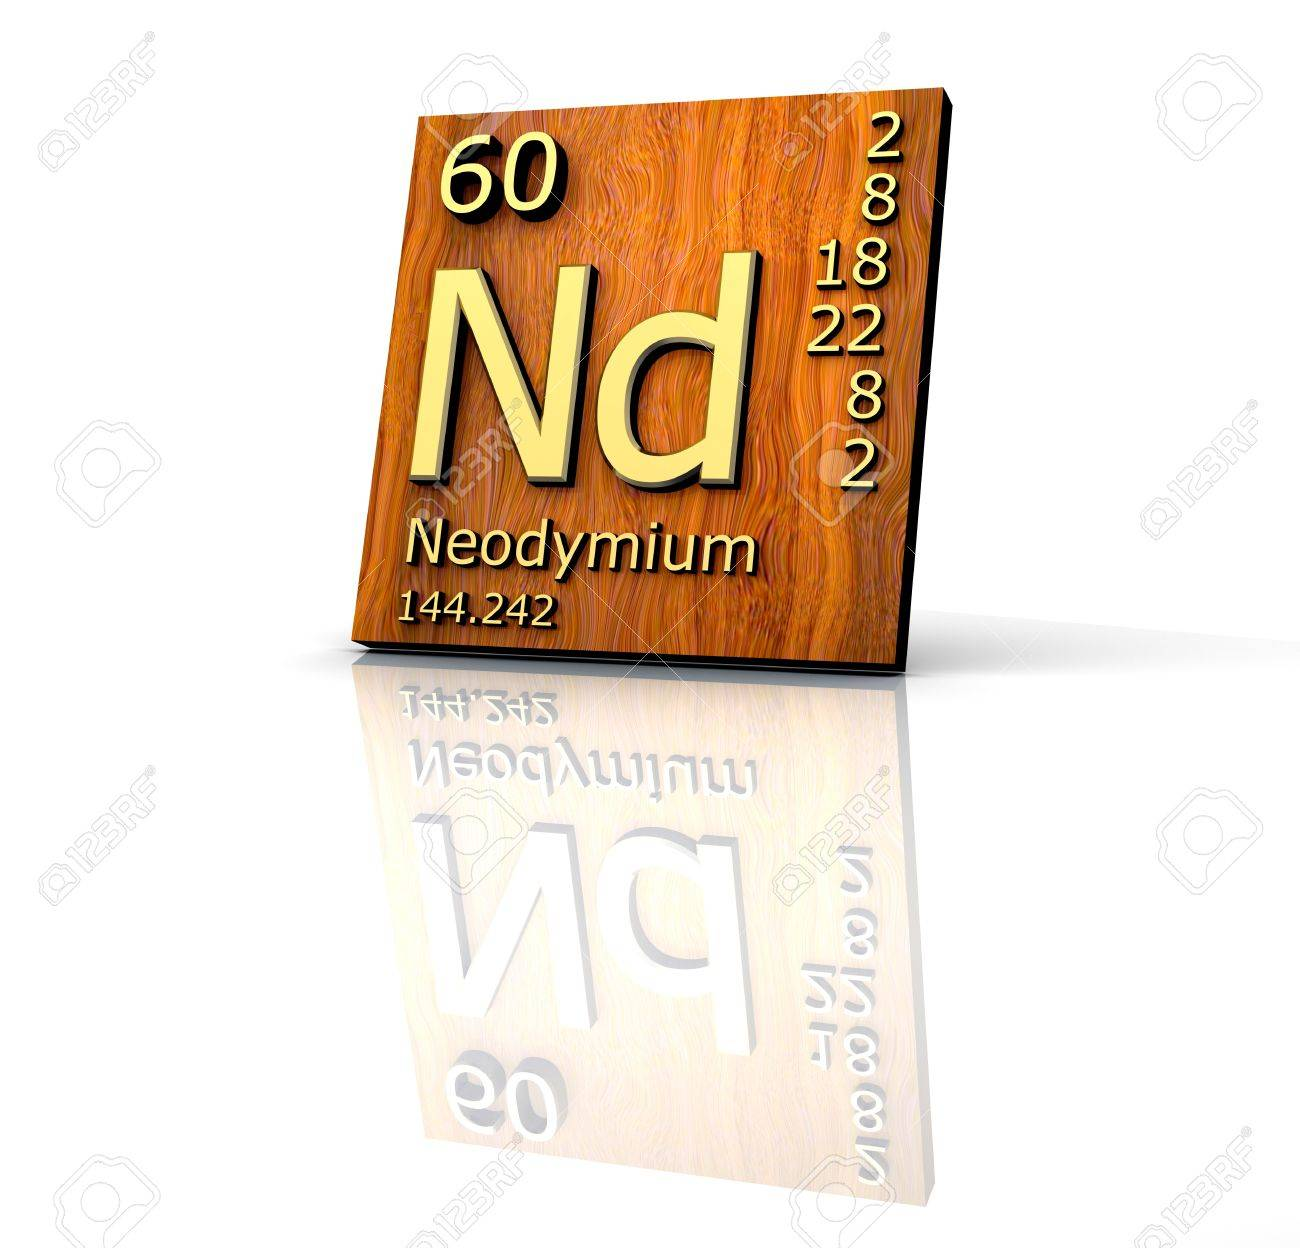 Neodymium form periodic table of elements wood board 3d made neodymium form periodic table of elements wood board 3d made stock photo 7247255 gamestrikefo Choice Image